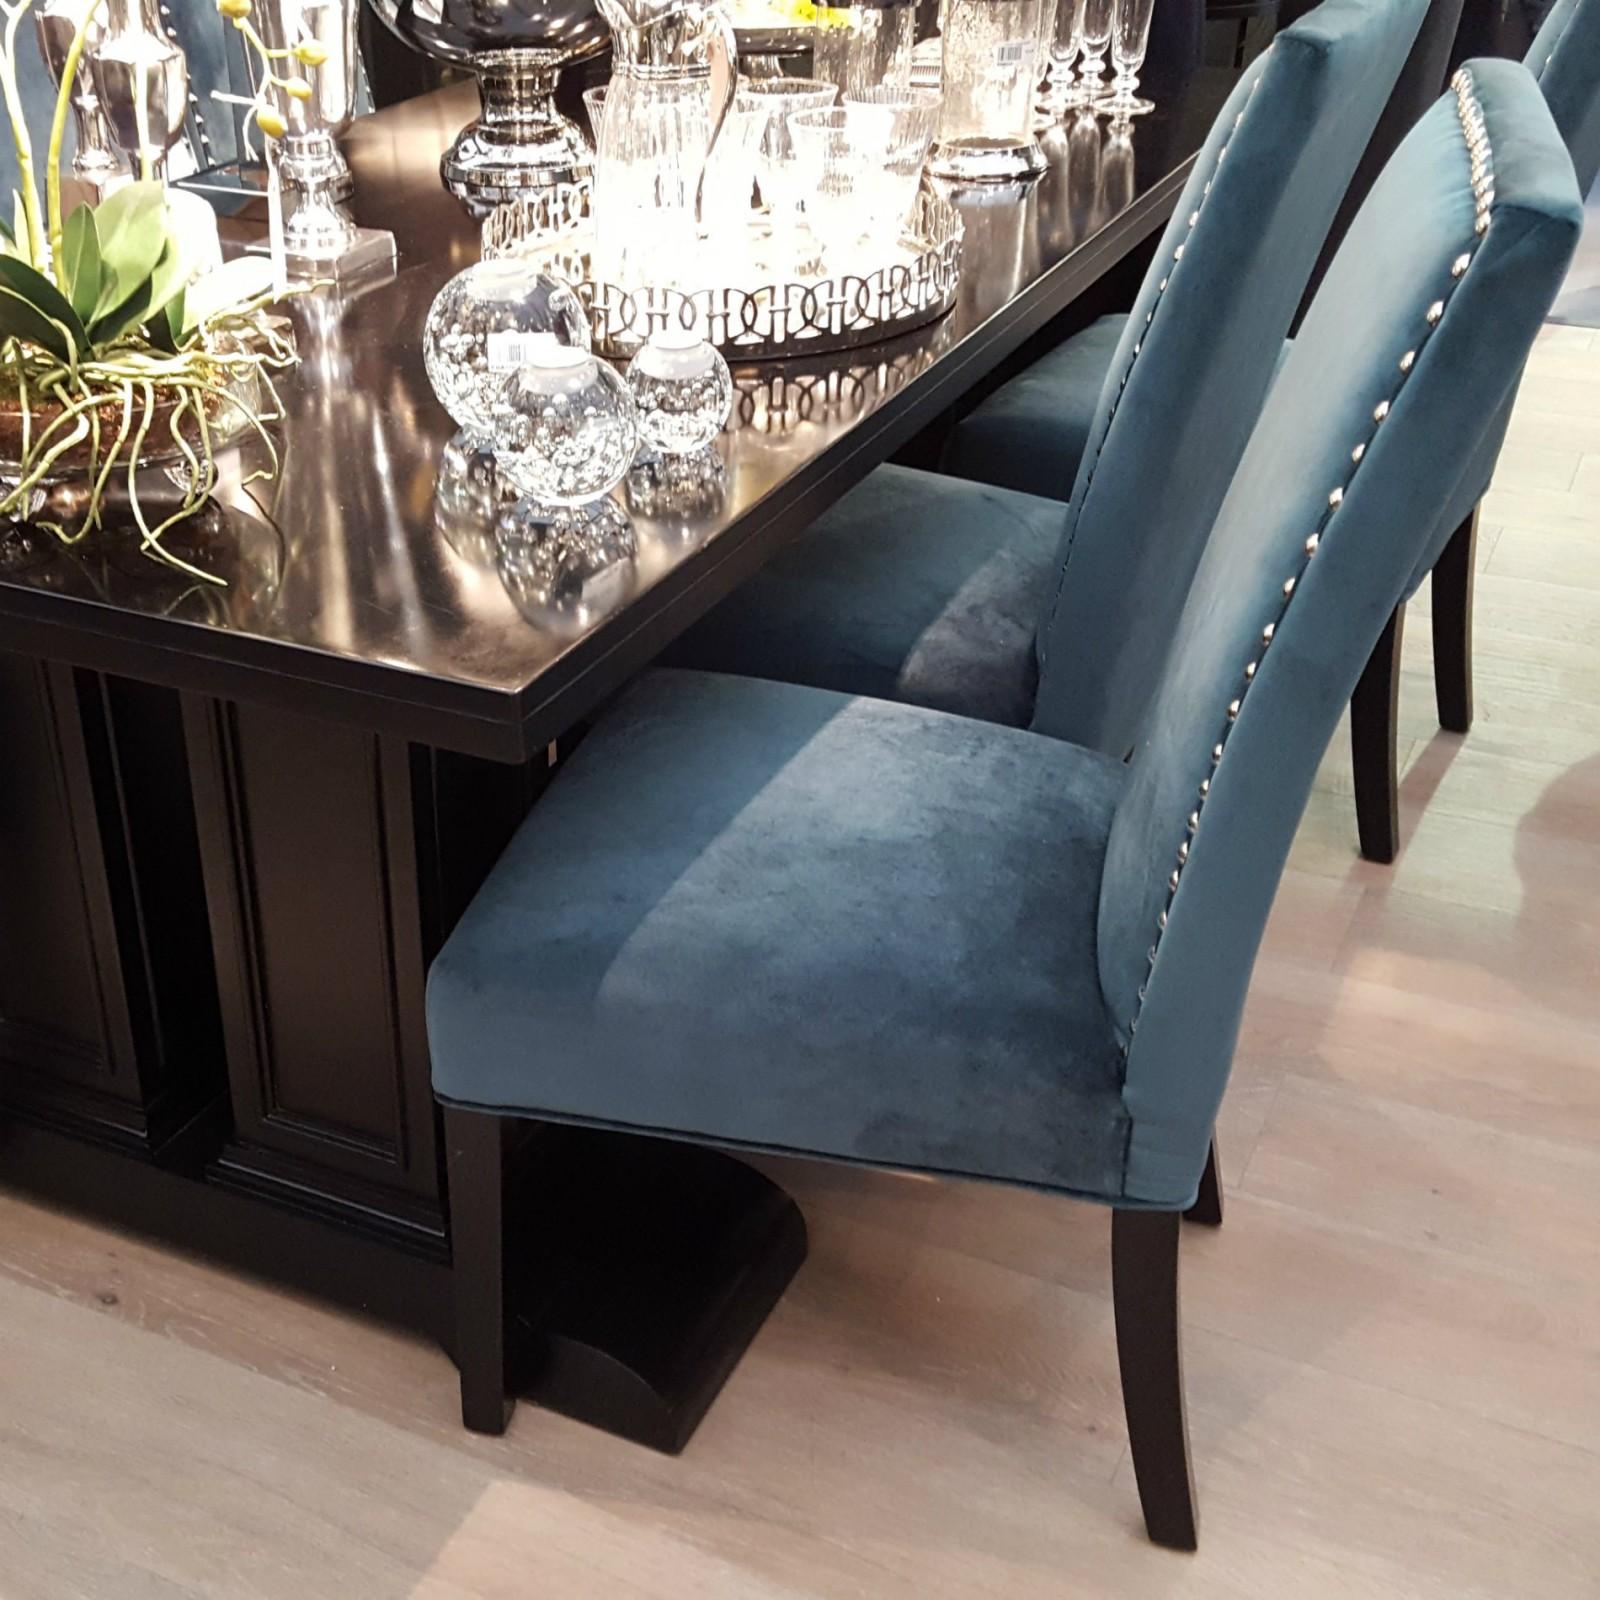 Gaillard Studded Dining Chair Furniture La Maison Chic